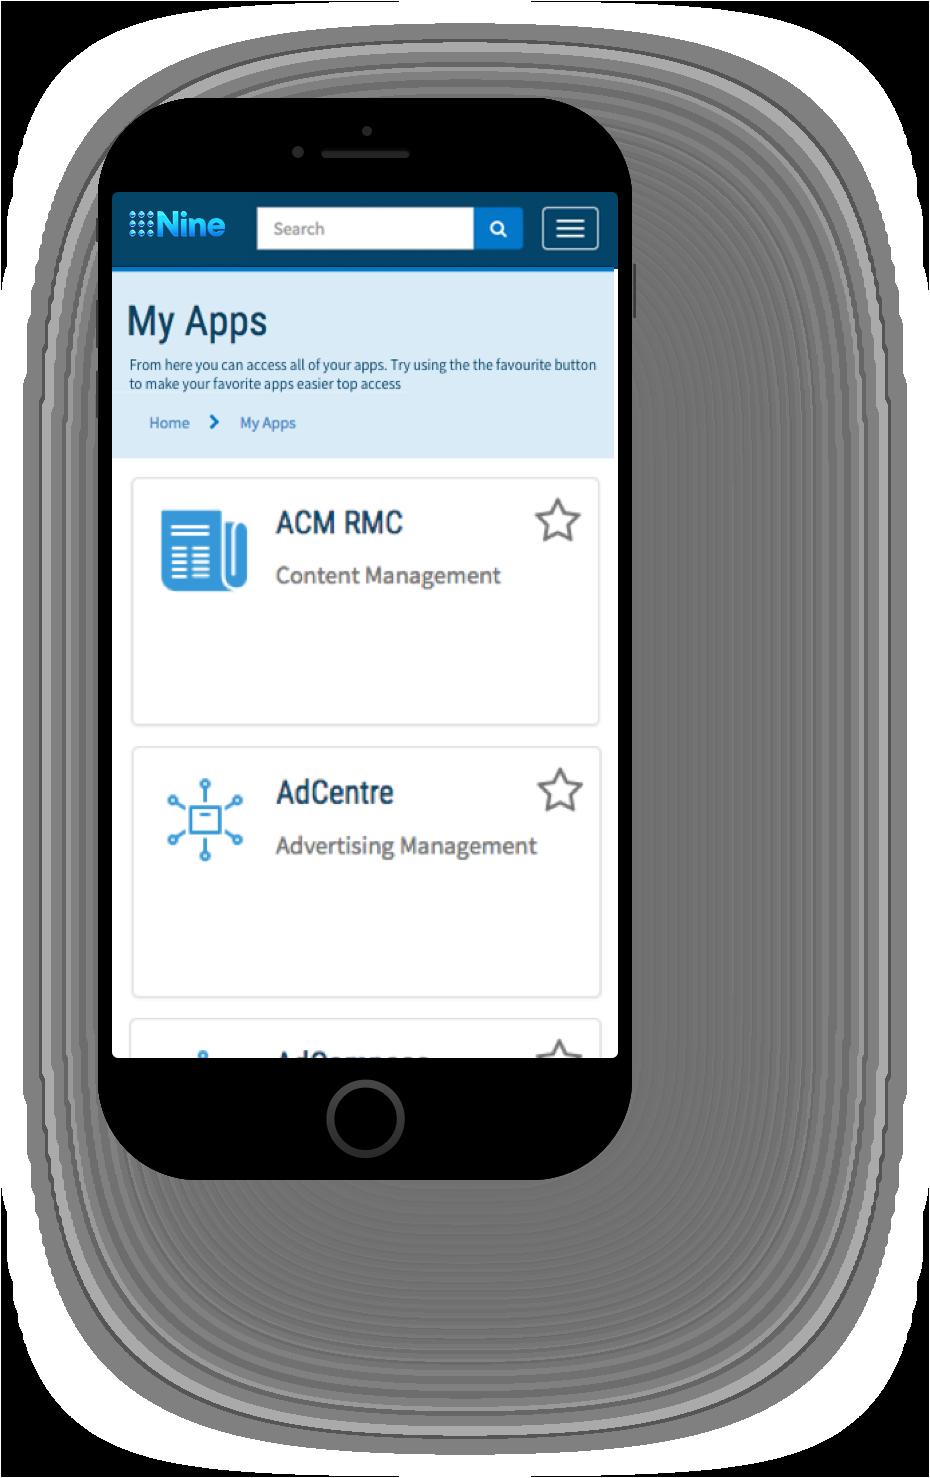 Mobile Menu Screenshot of Channel Nine ServiceNow Service Portal